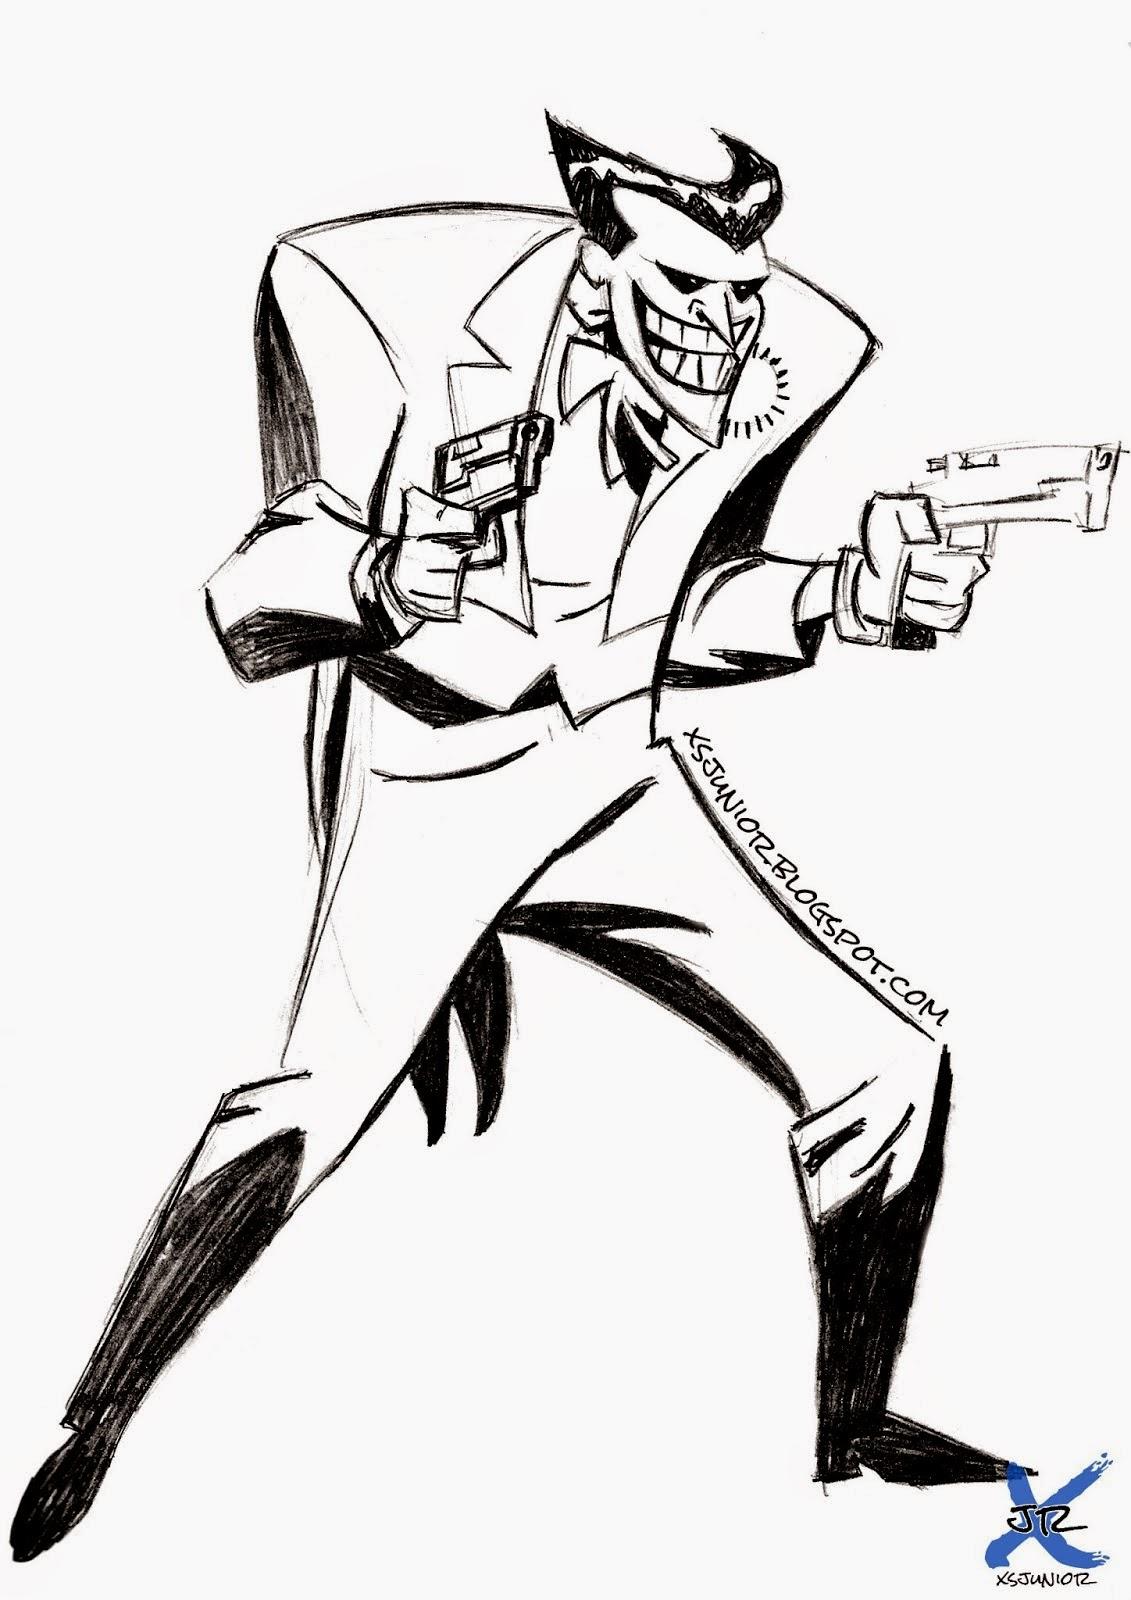 Dibujo con lapiz dibujo del joker para entrenar l neas y for Papel para dibujar